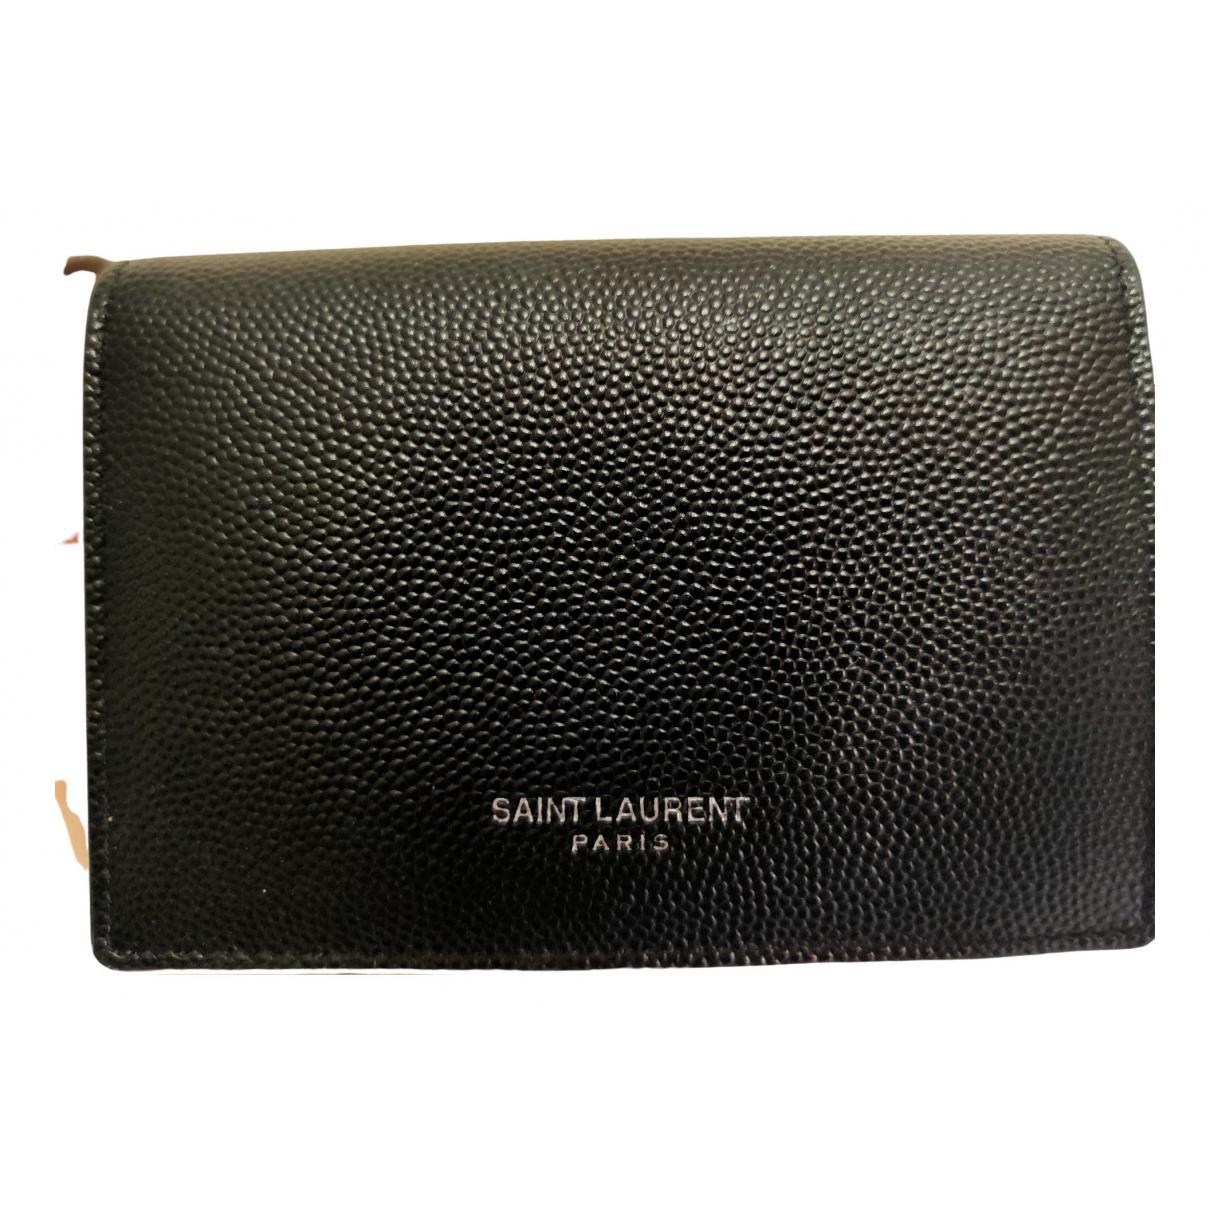 Saint Laurent \N Kleinlederwaren in  Schwarz Leder